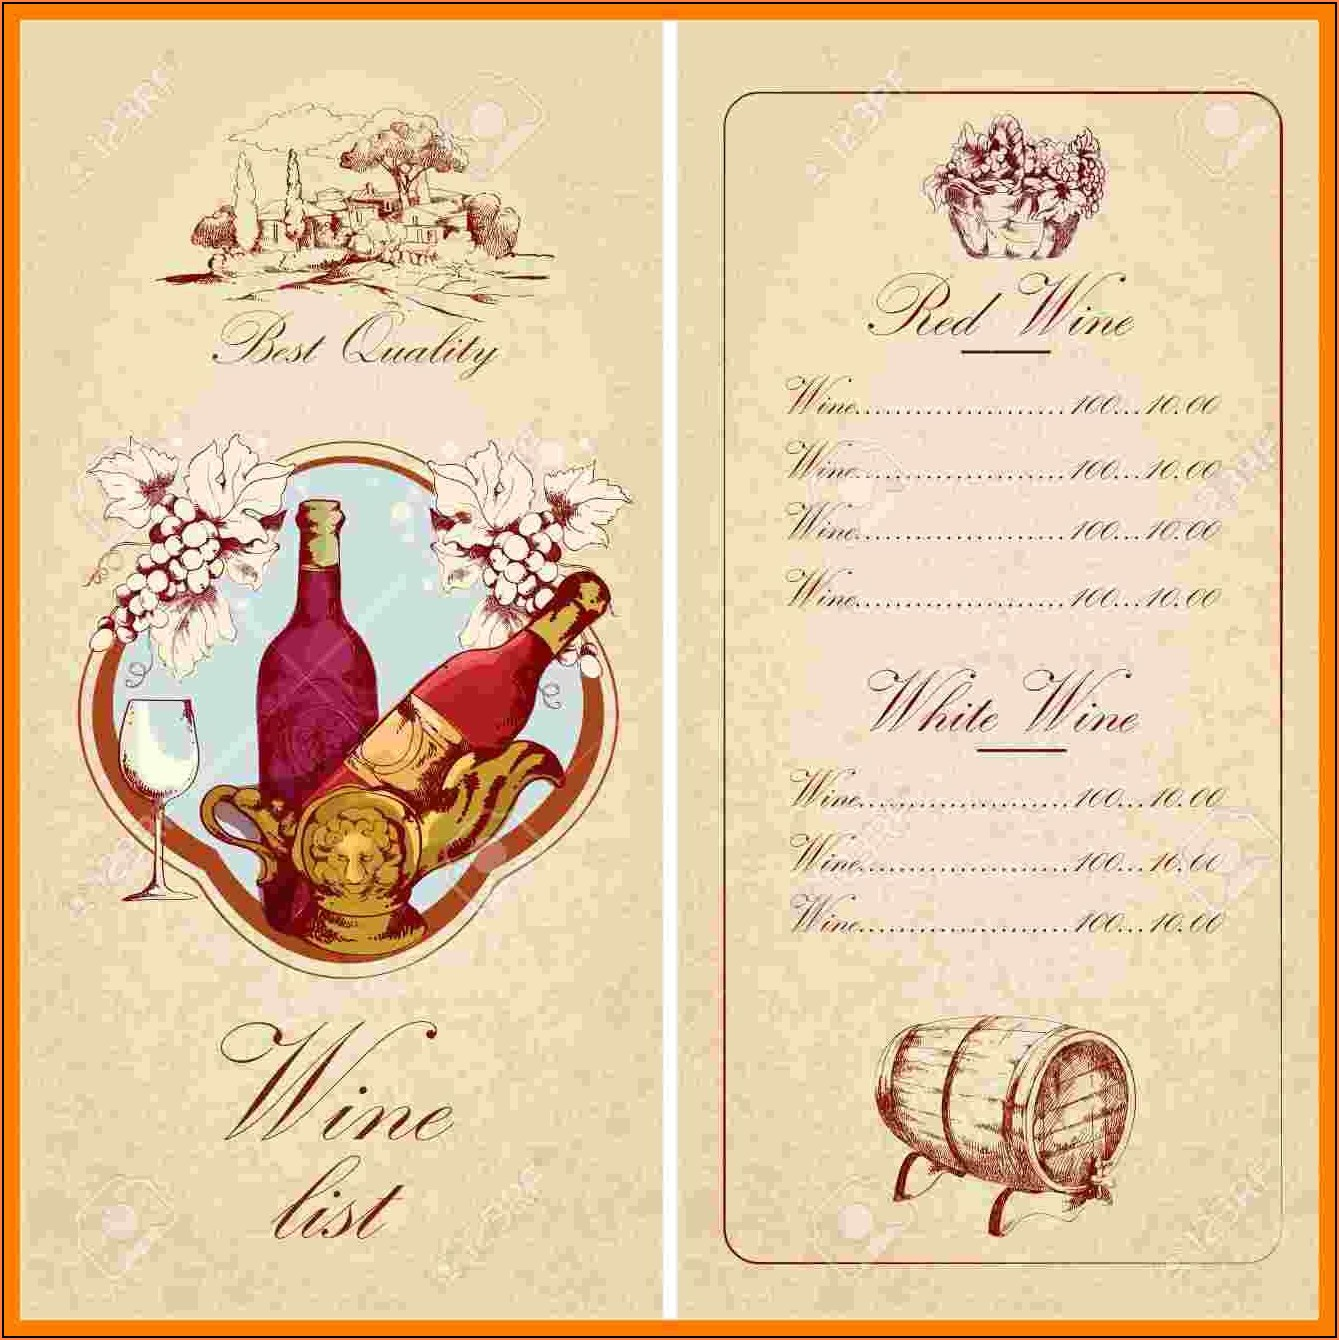 Wine List Menu Template Free